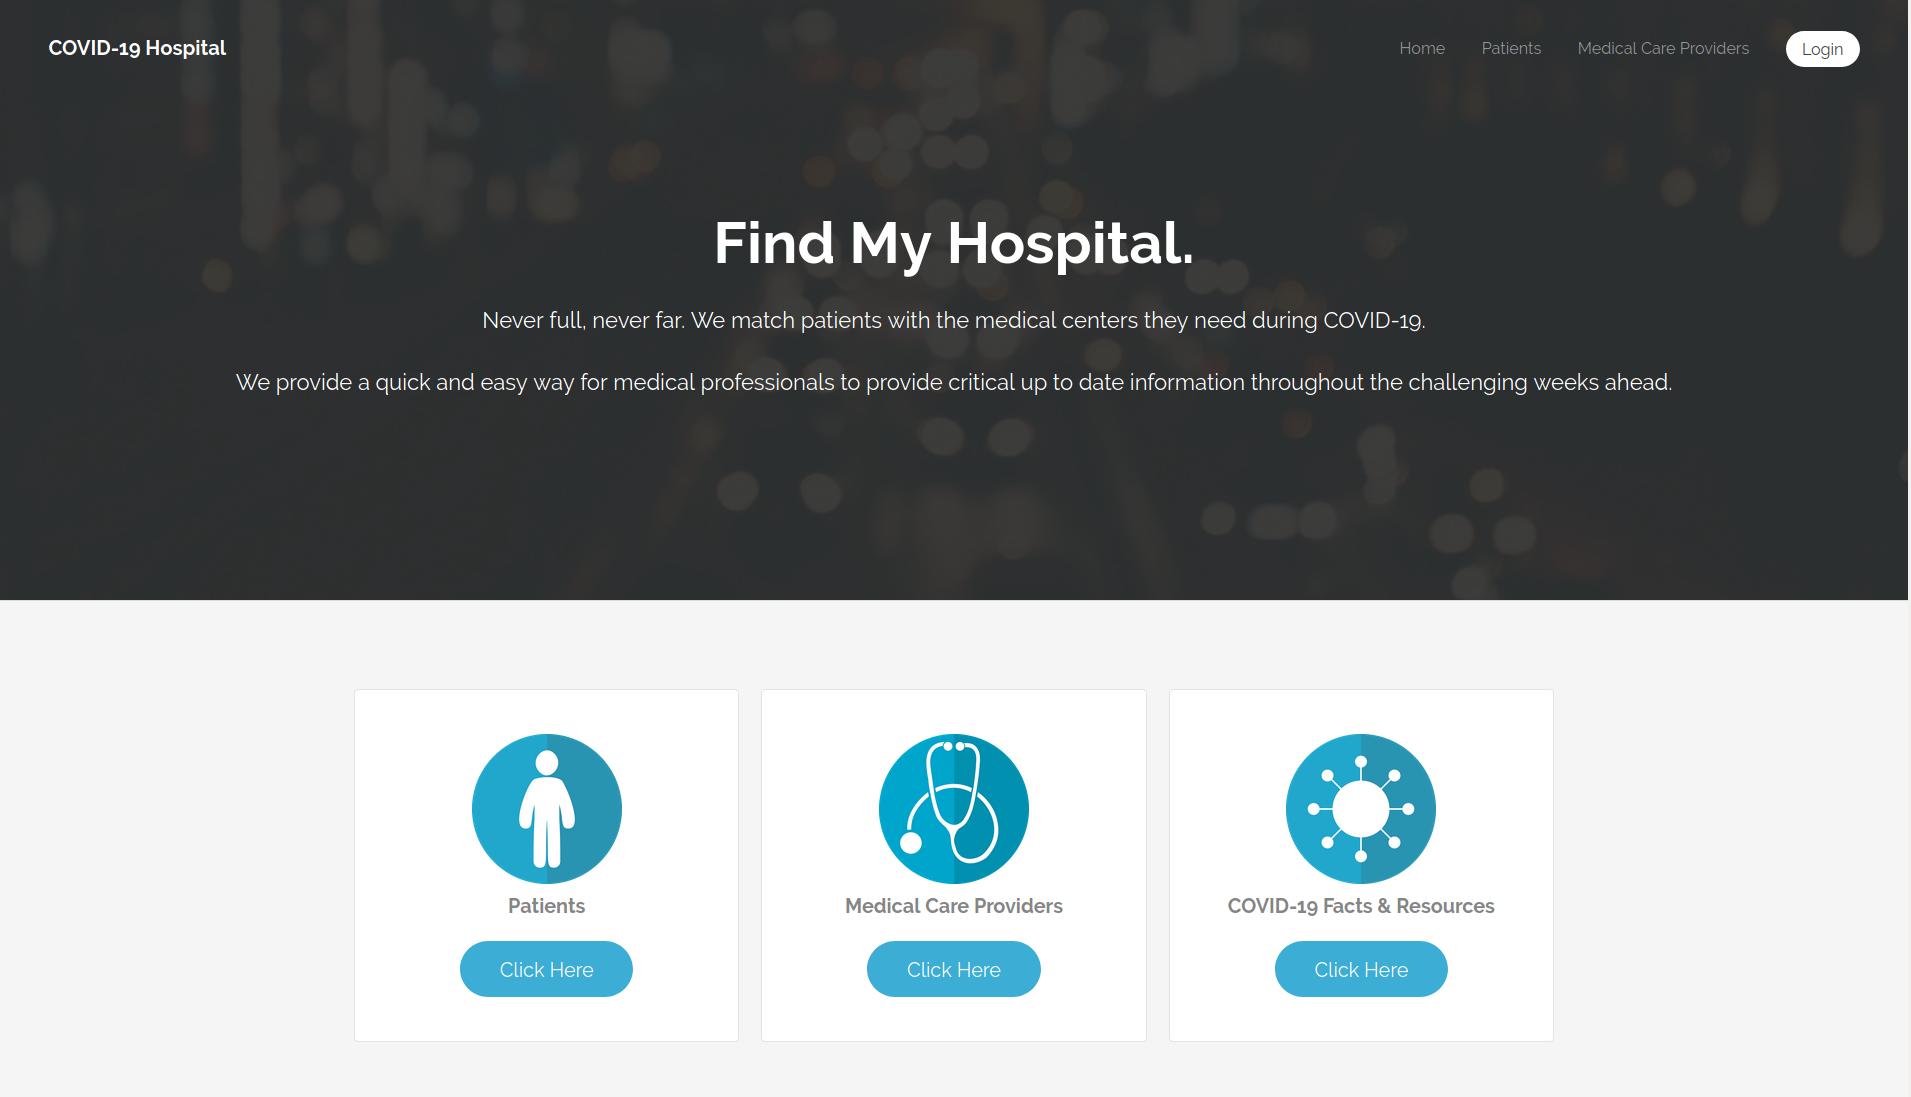 CovidHospital.org